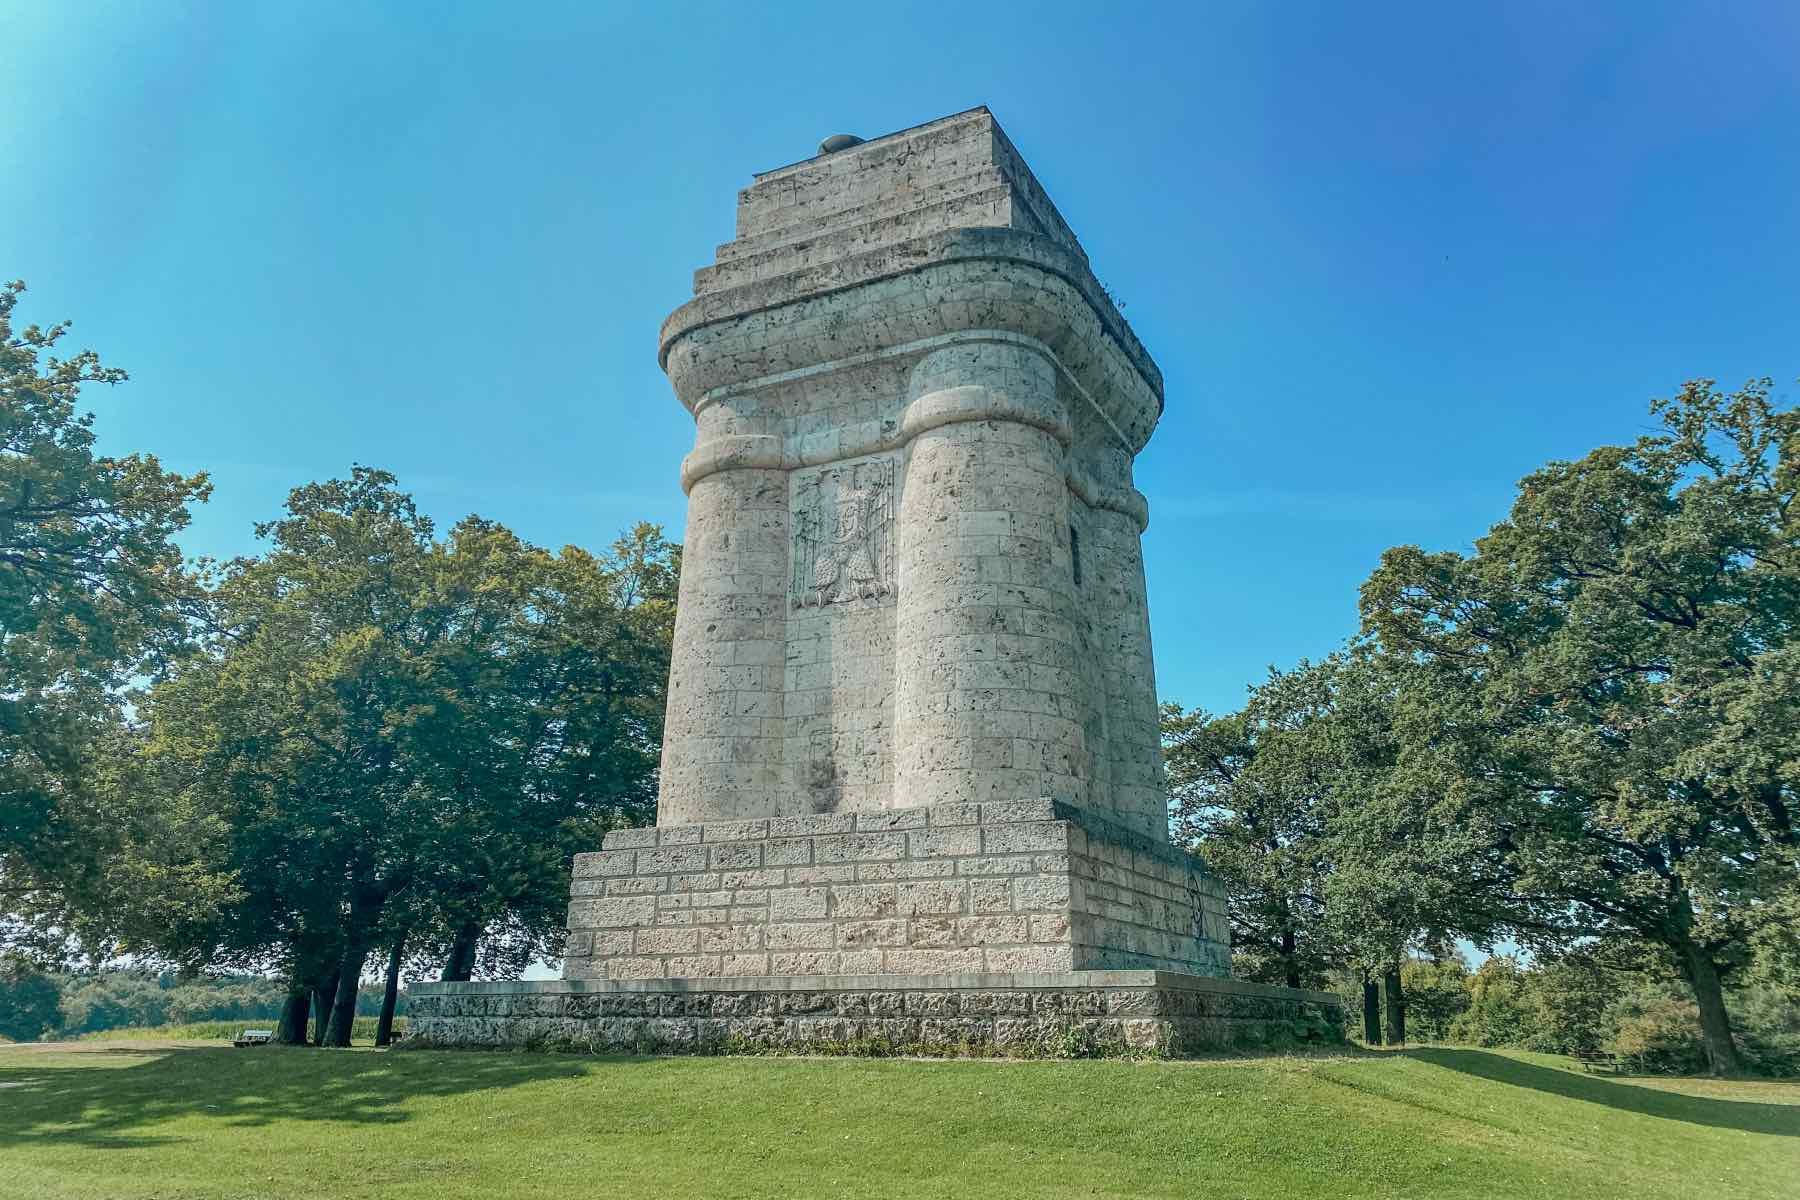 Geheimtipp Augsburg Bismarck Turm 2